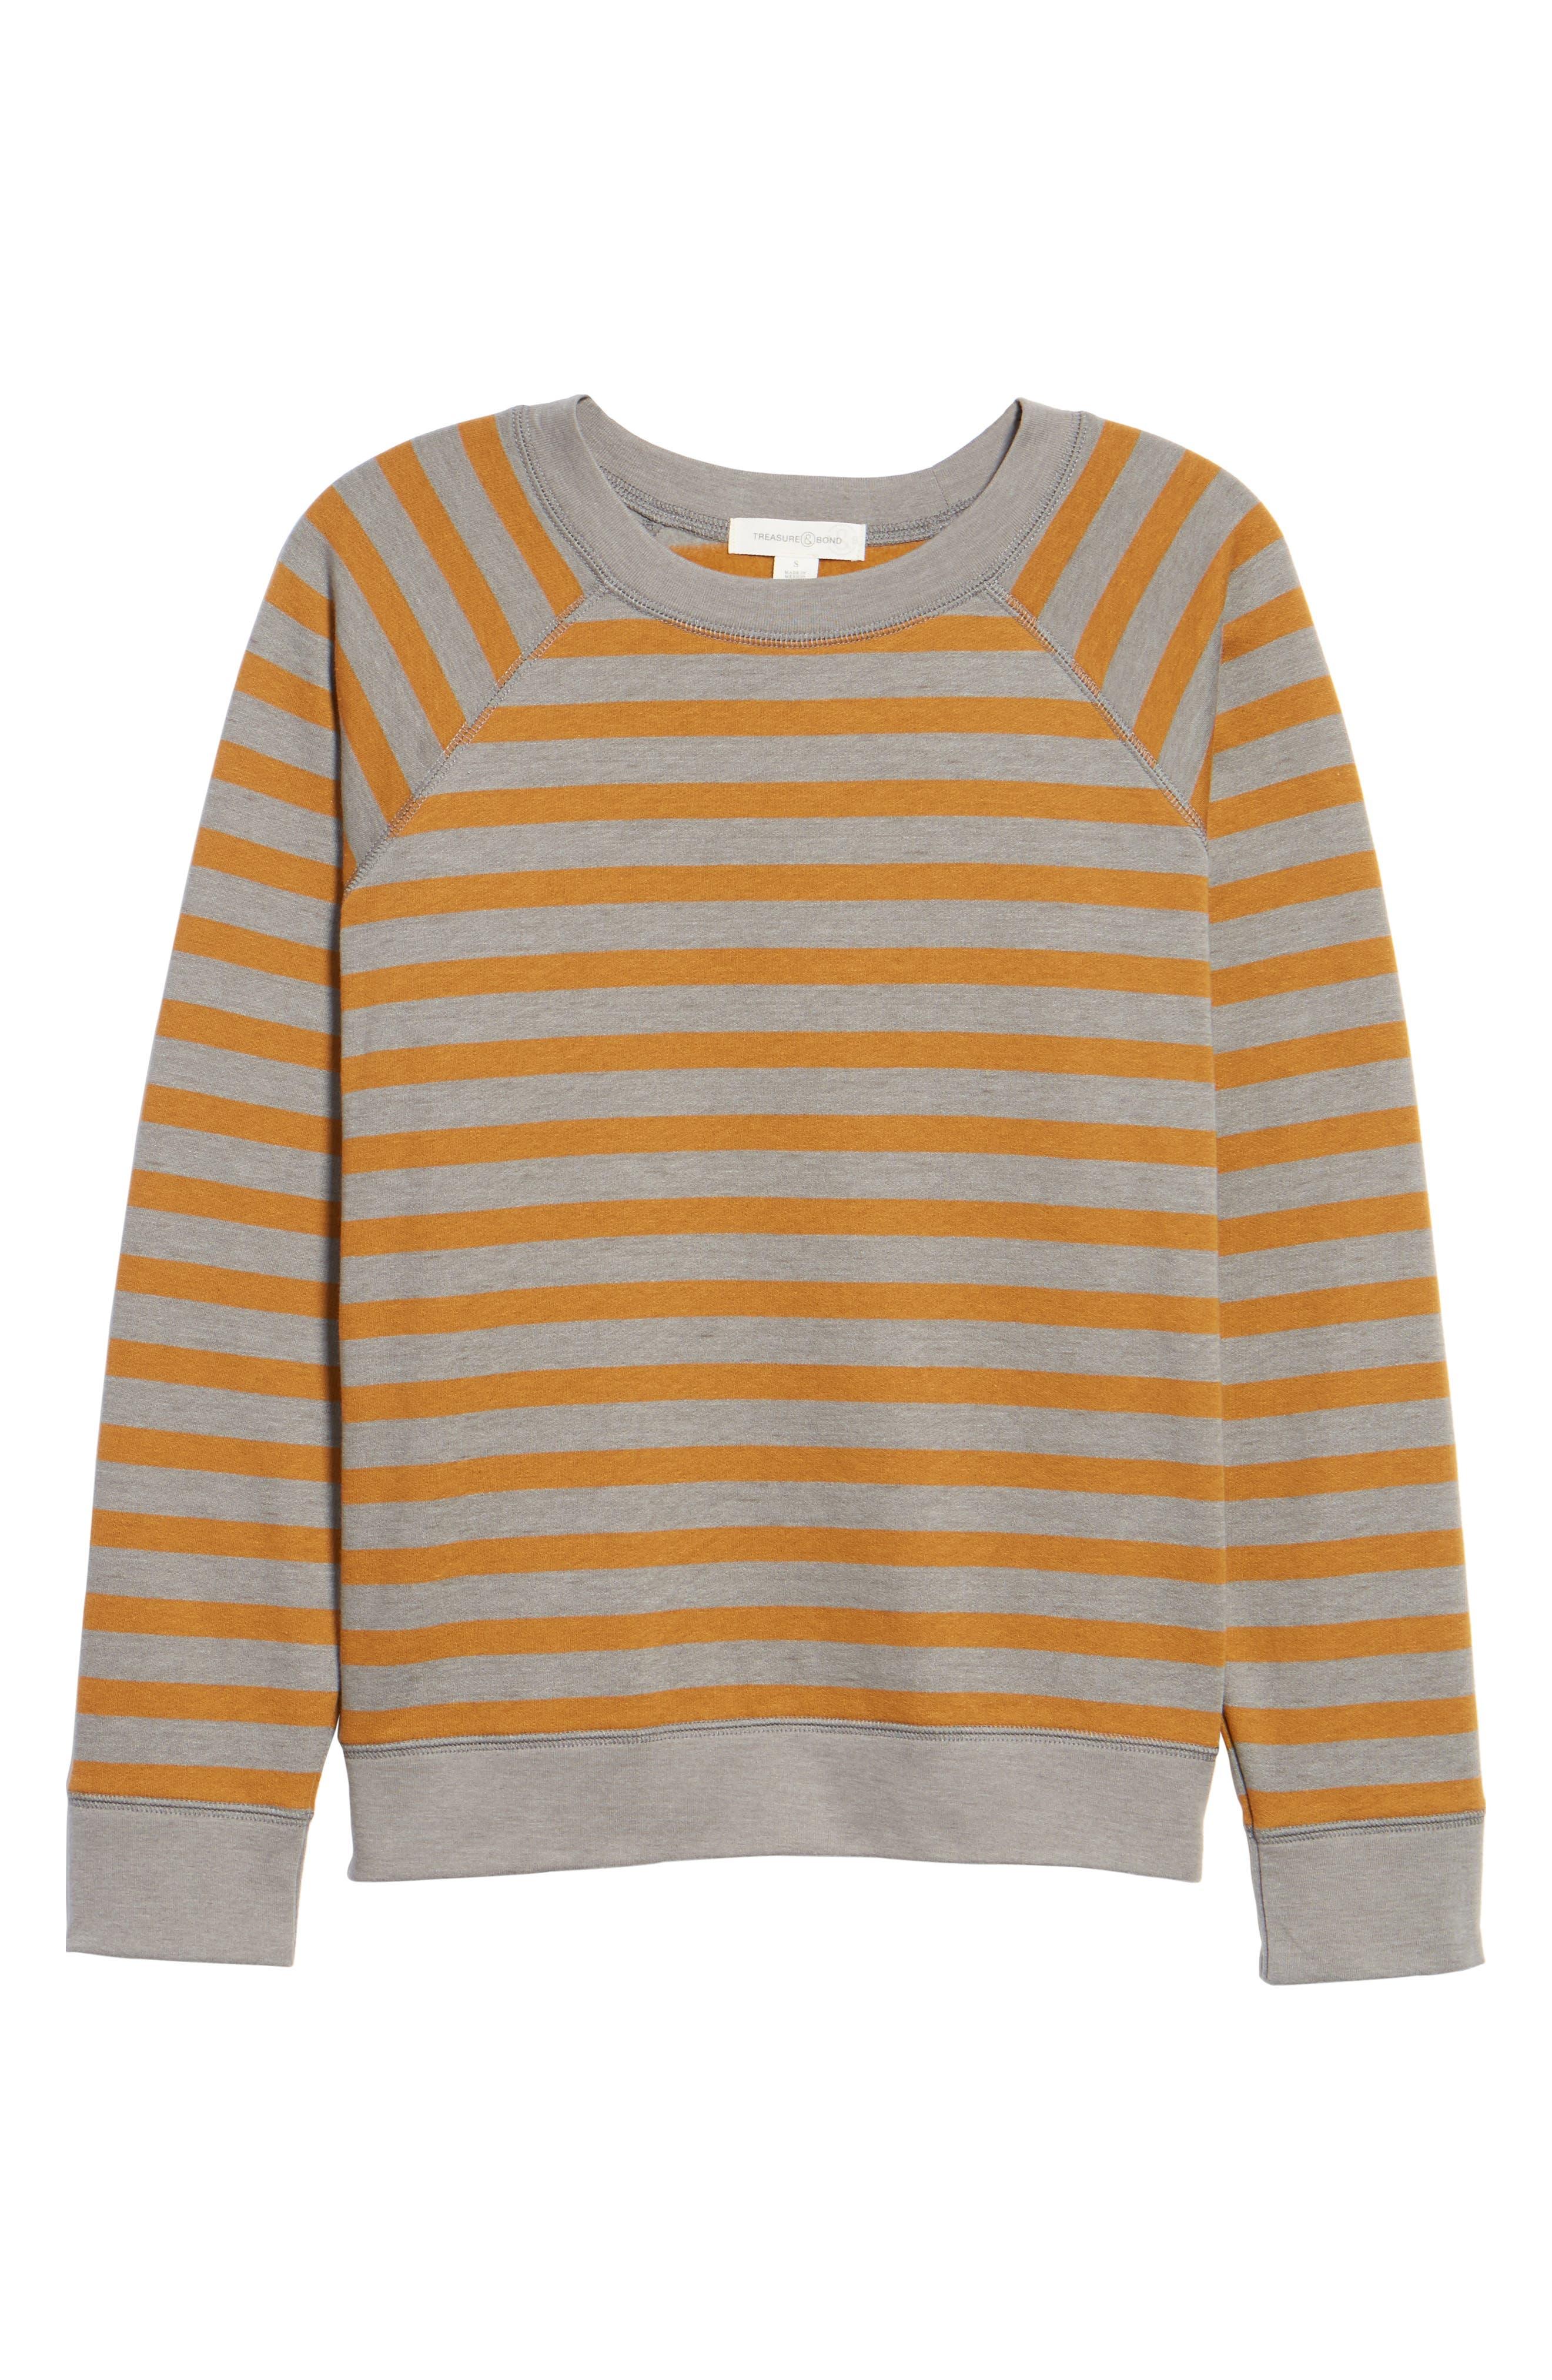 Crewneck Sweatshirt,                             Alternate thumbnail 6, color,                             021